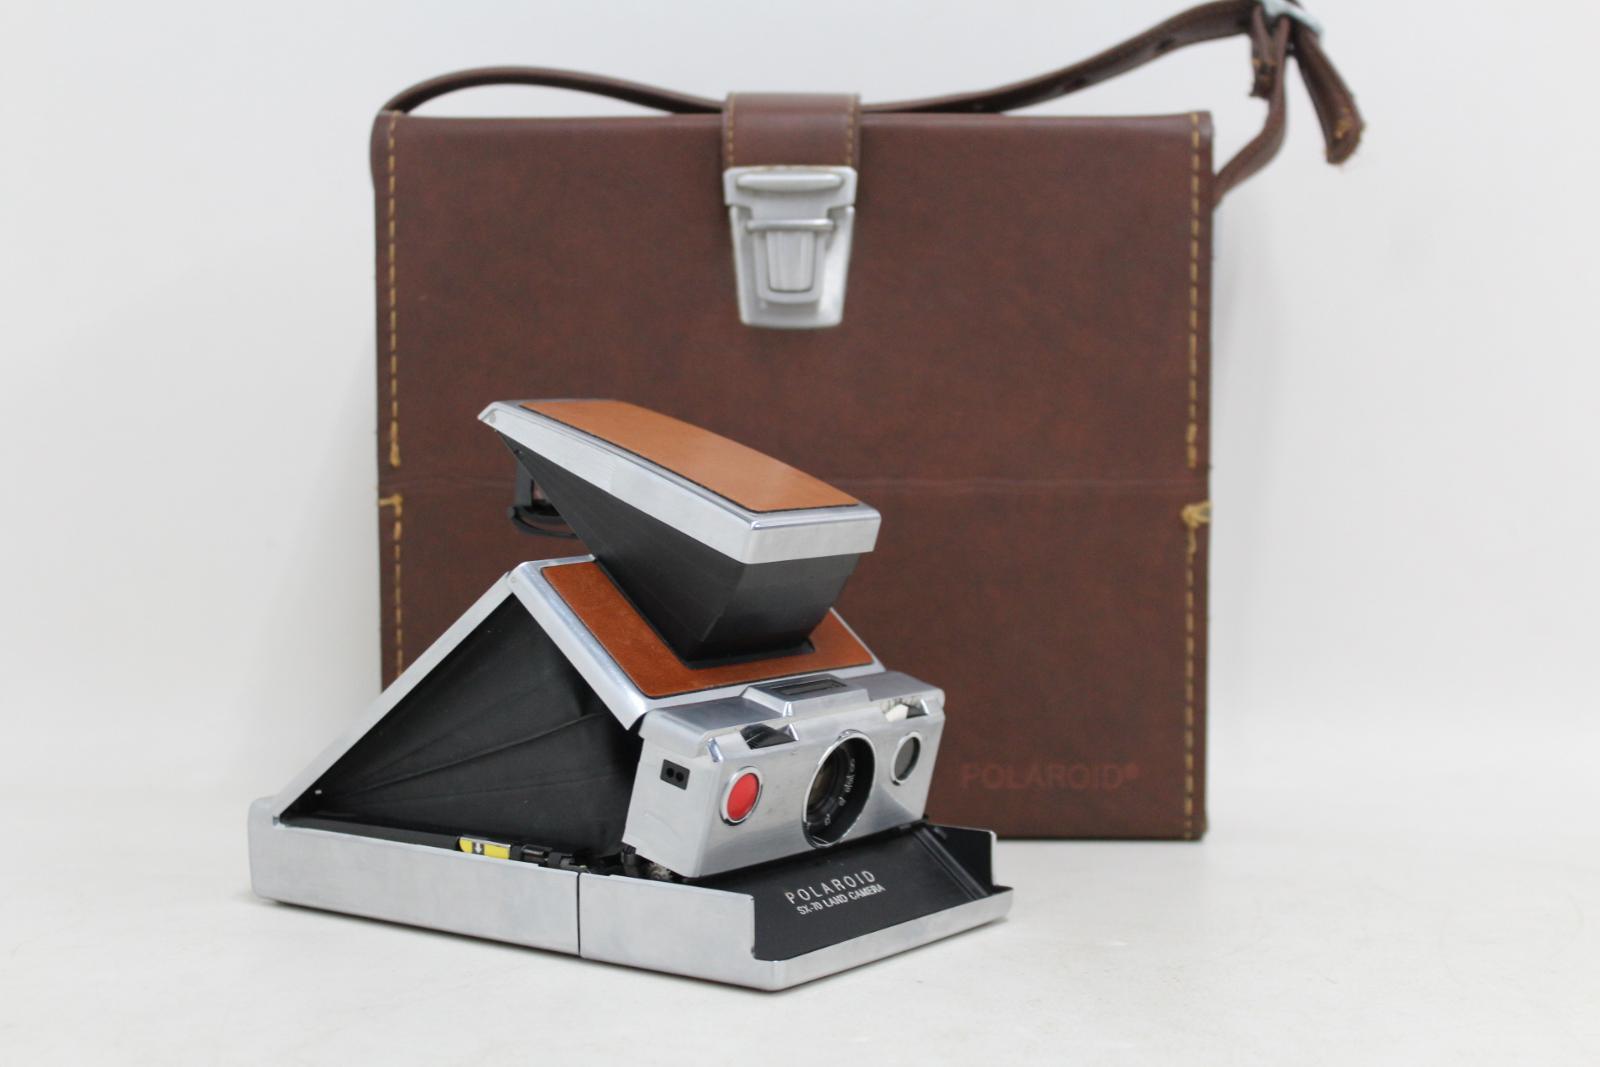 POLAROID SX-70 Land Camera Leather Body Vintage With Original Leather Bag 2  2 sur 12 ... 8fff1f530ff